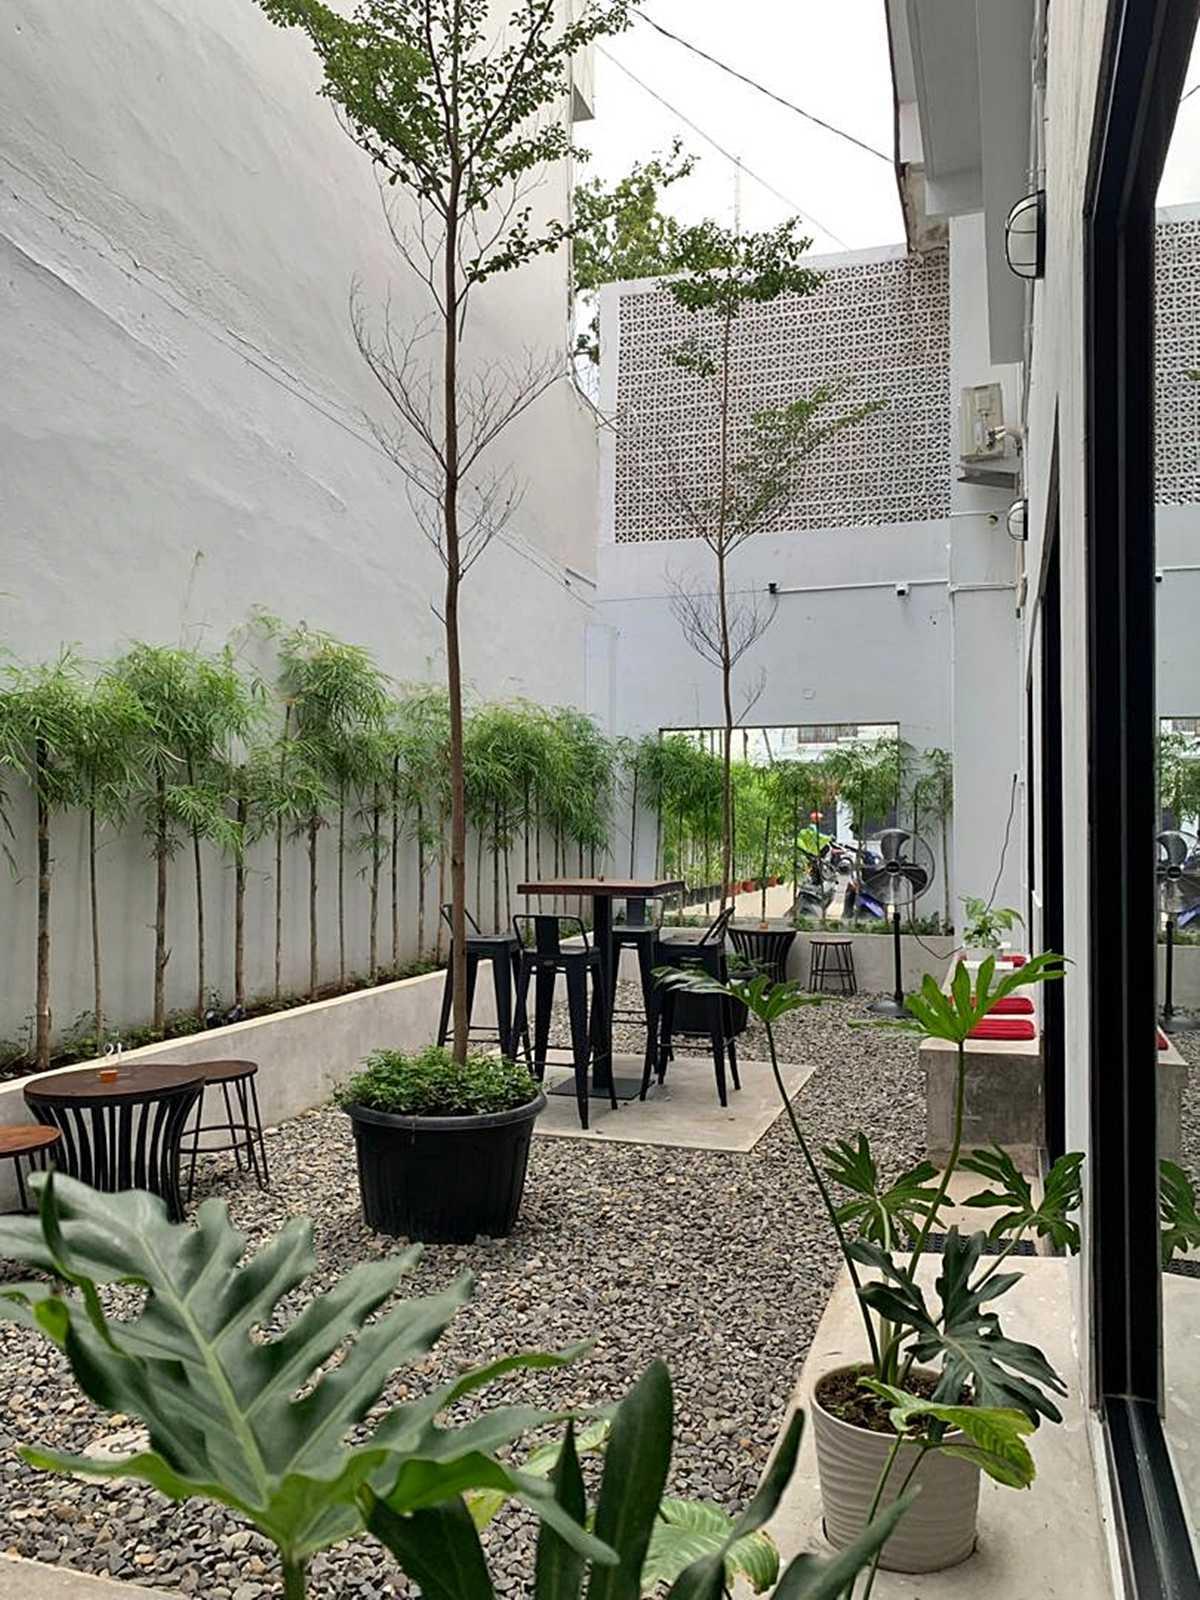 Bd Studio Tamoe Coffee & Resto Medan, Kota Medan, Sumatera Utara, Indonesia Medan, Kota Medan, Sumatera Utara, Indonesia Bd-Studio-Tamoe-Coffee-Resto  80744